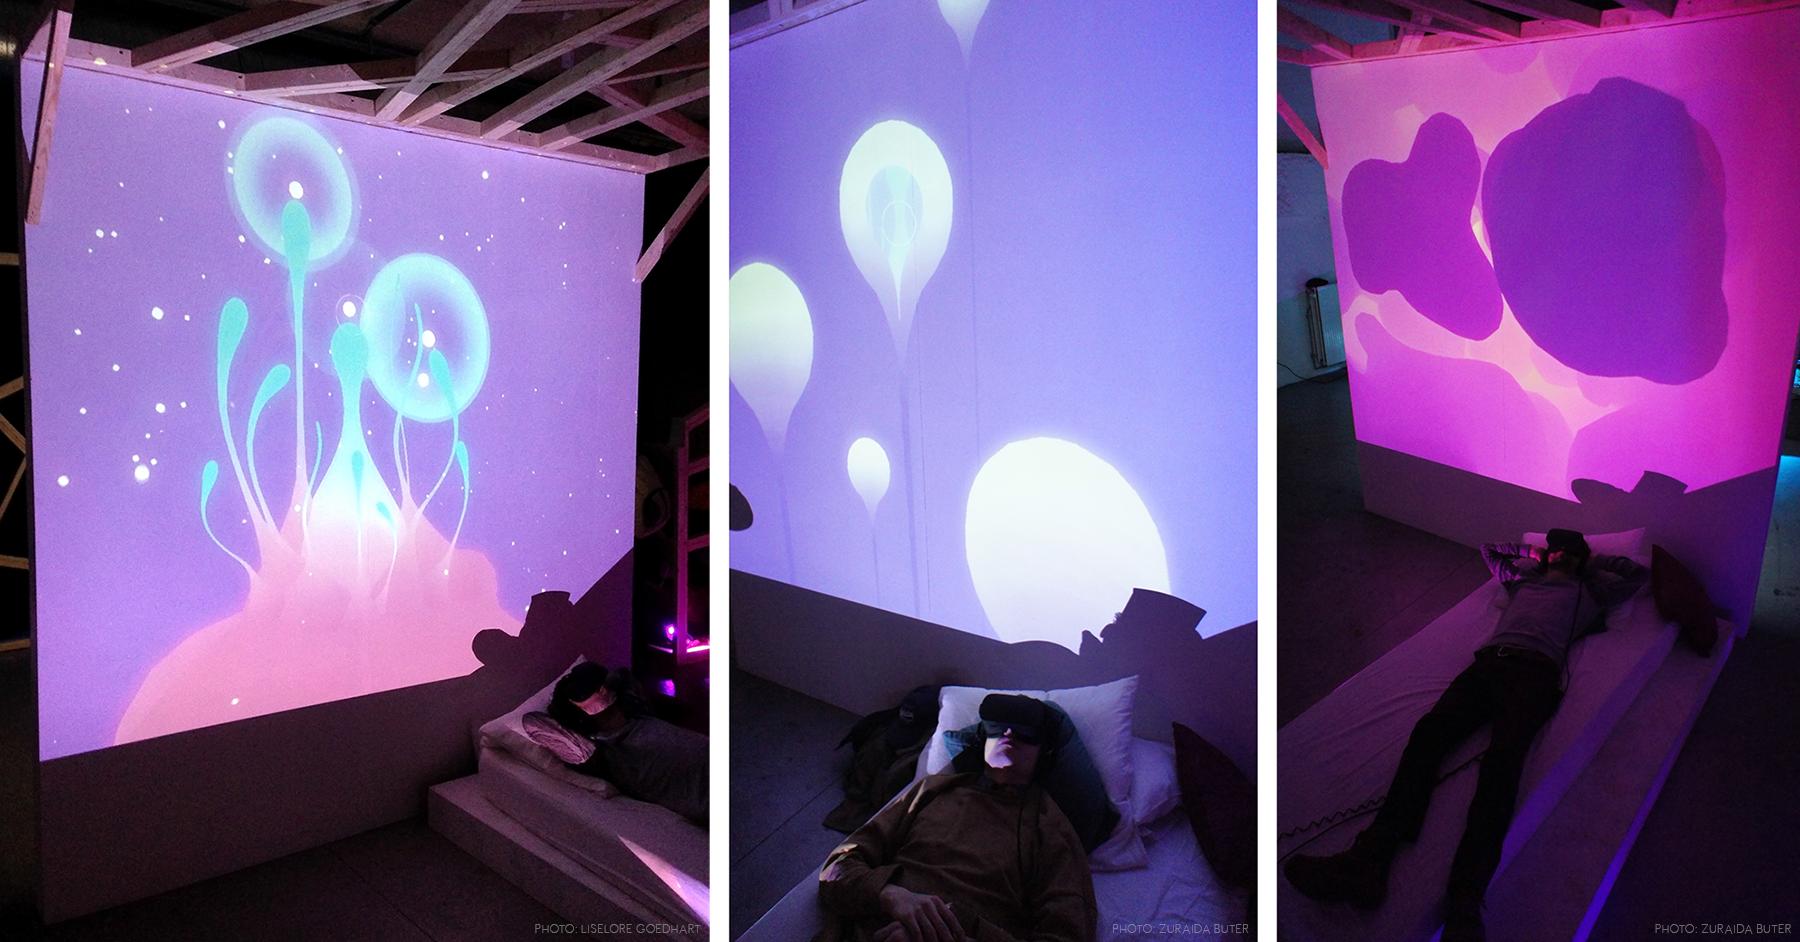 Second + third photo courtesy of  zo-ii , exhibition setup by Zuraida Buter & Screenshake